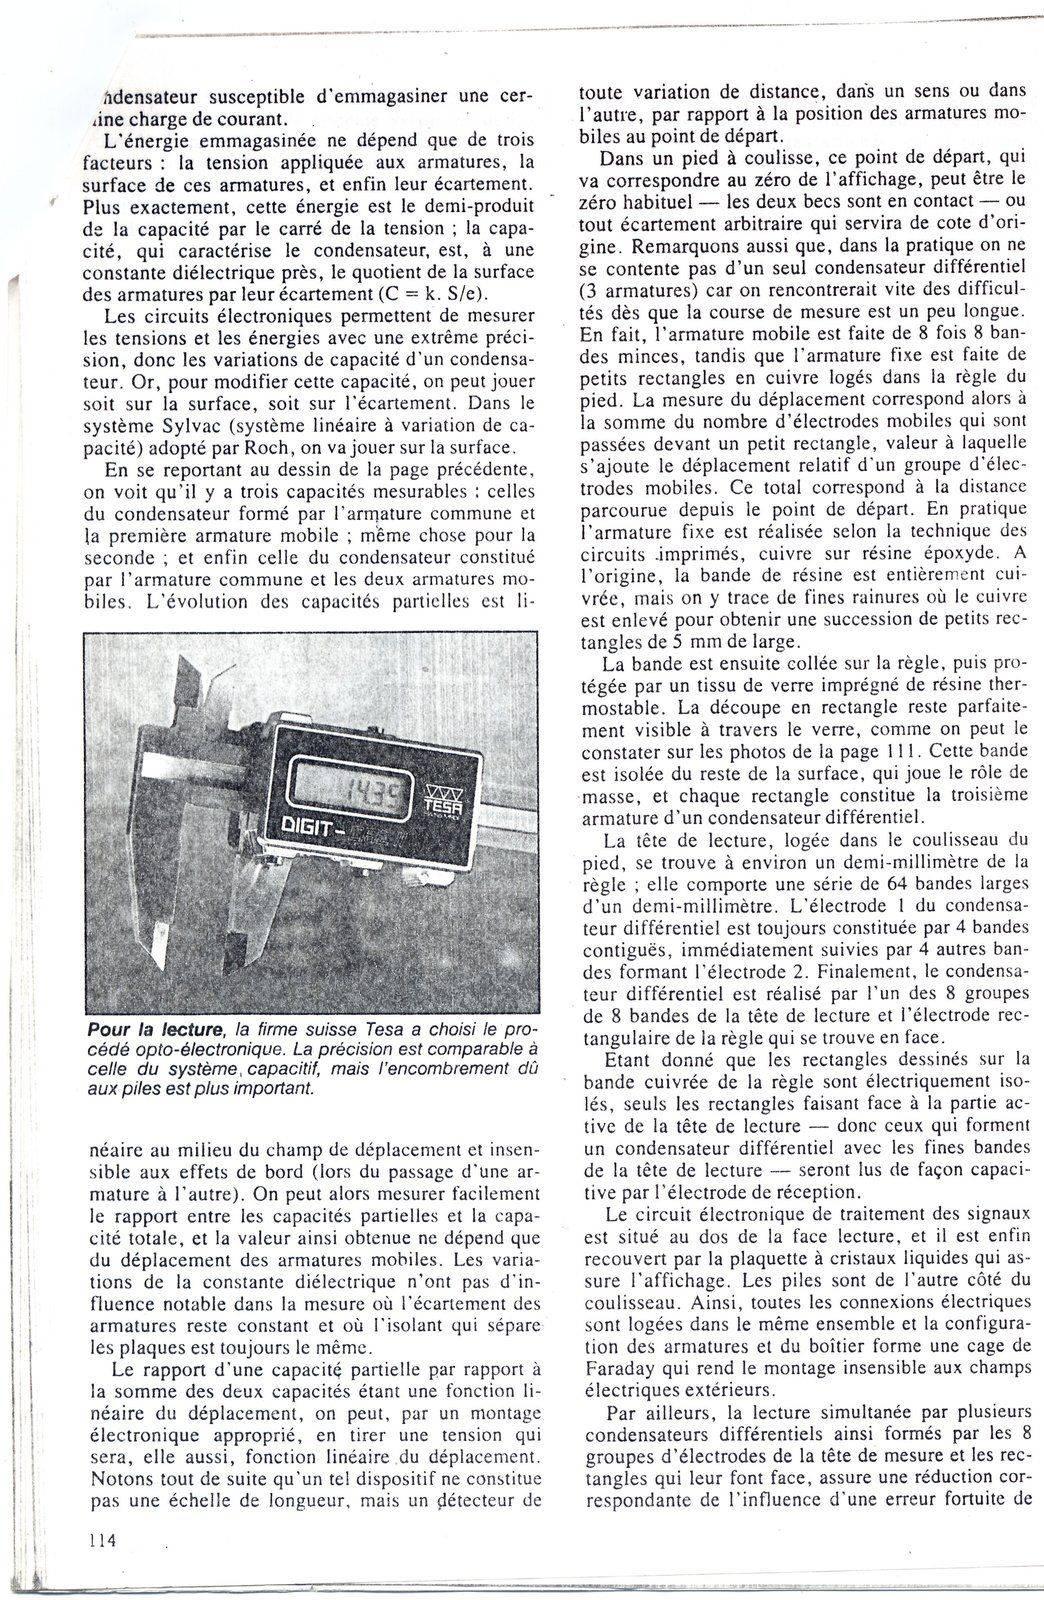 Mesurelectroniques5.JPG